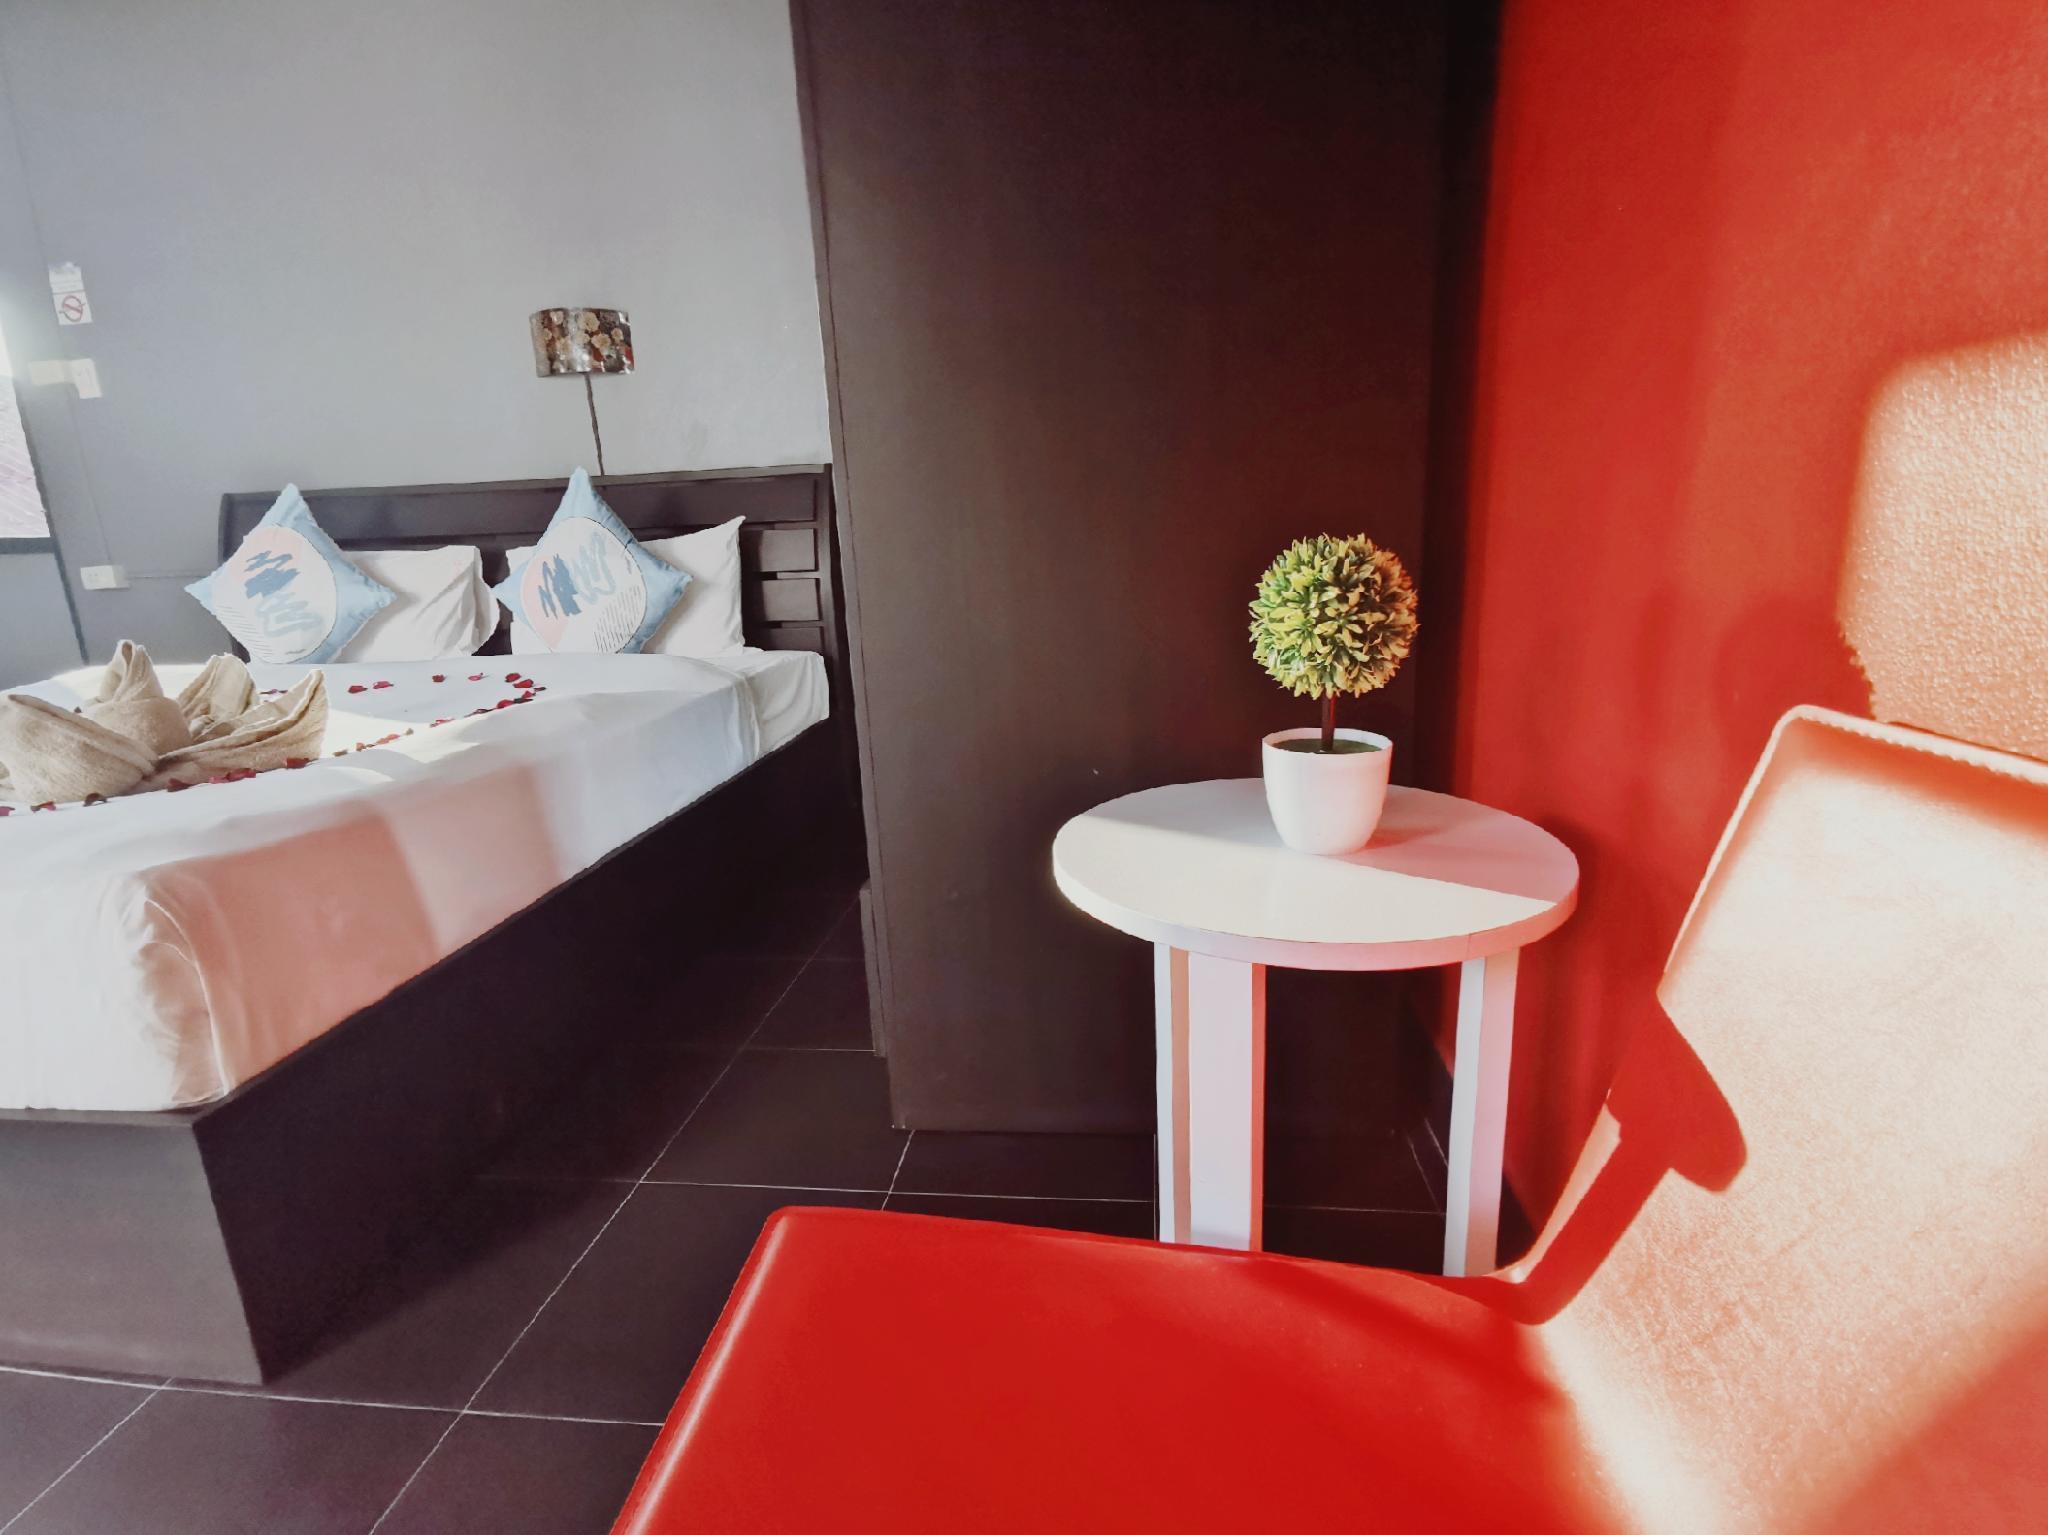 Patong Beach Nightlife King Bed Room Fast   Drink